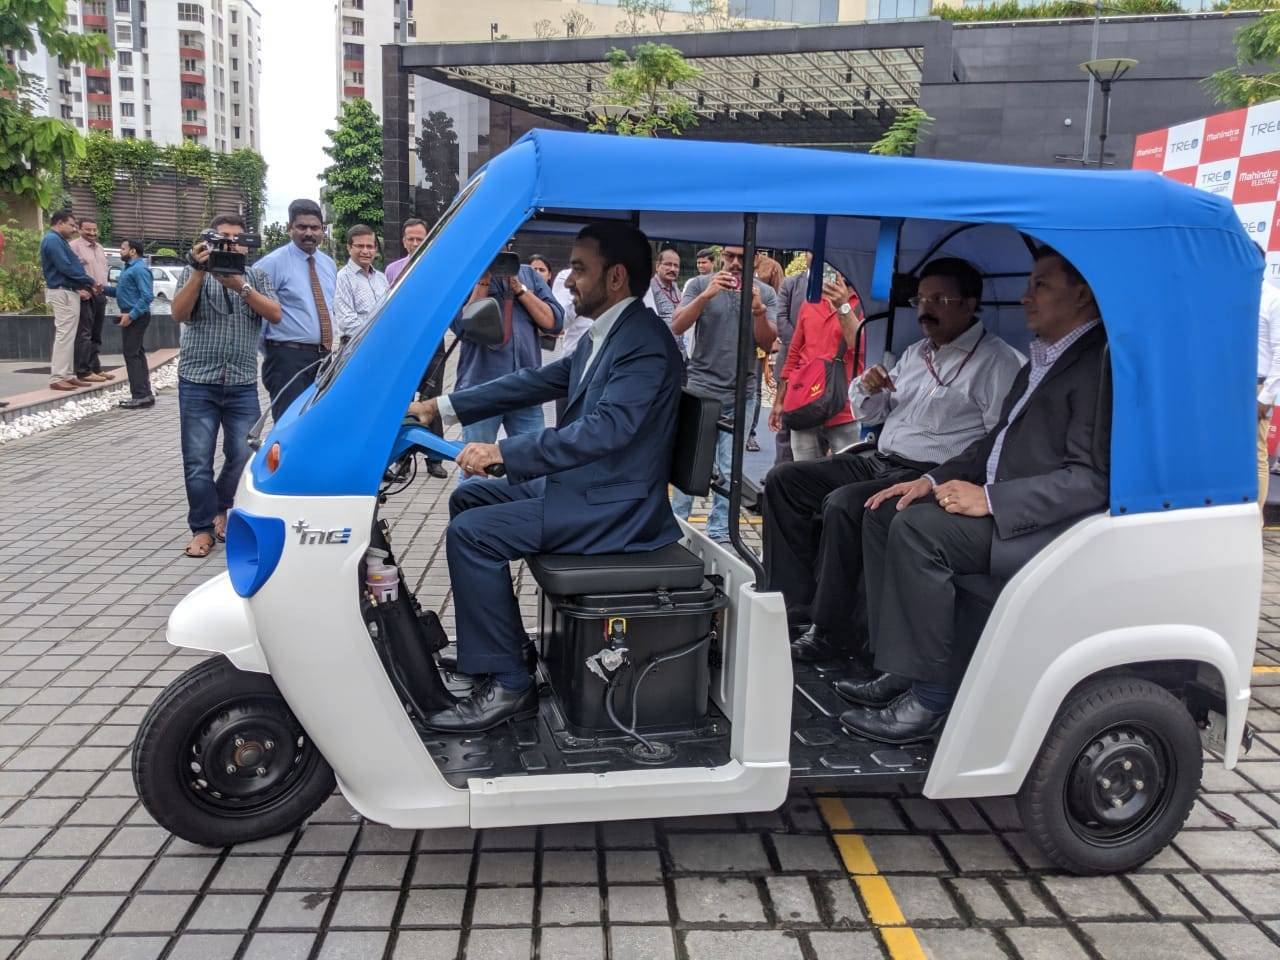 mahindra electric: Mahindra Electric launches Treo range in Kerala, Auto News, ET Auto